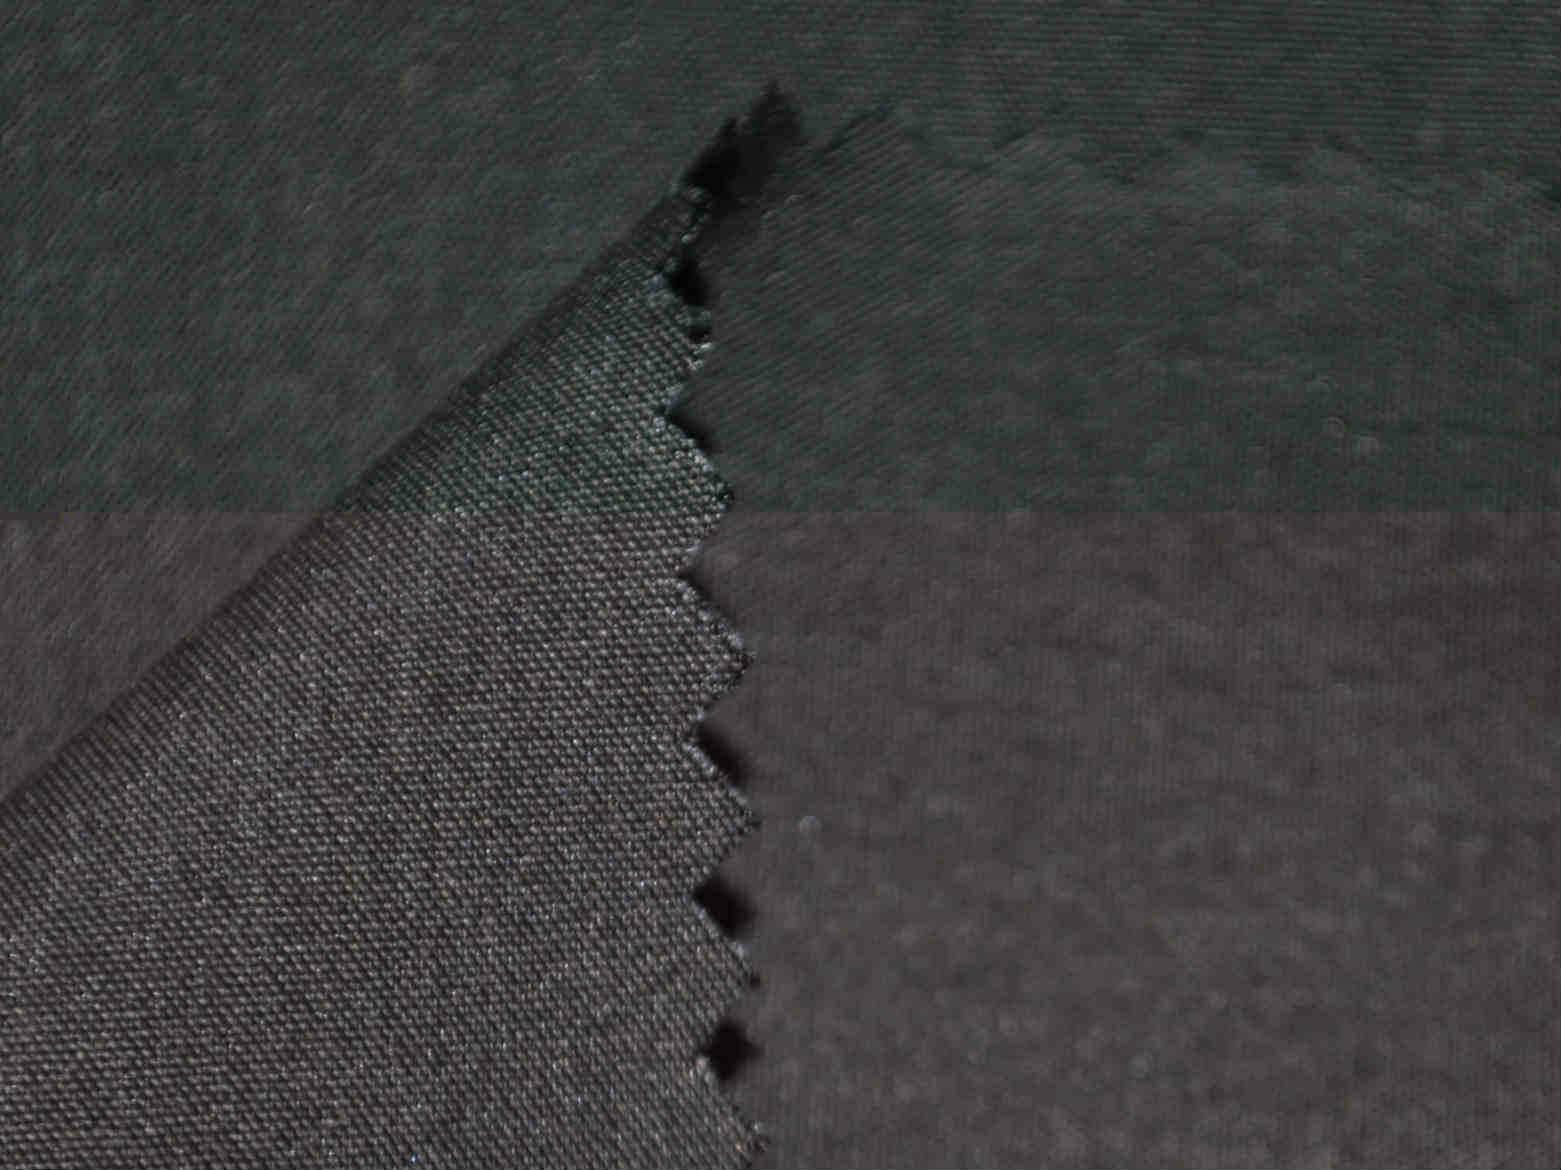 32S*100D Cotton/Nylon Mixed Plain